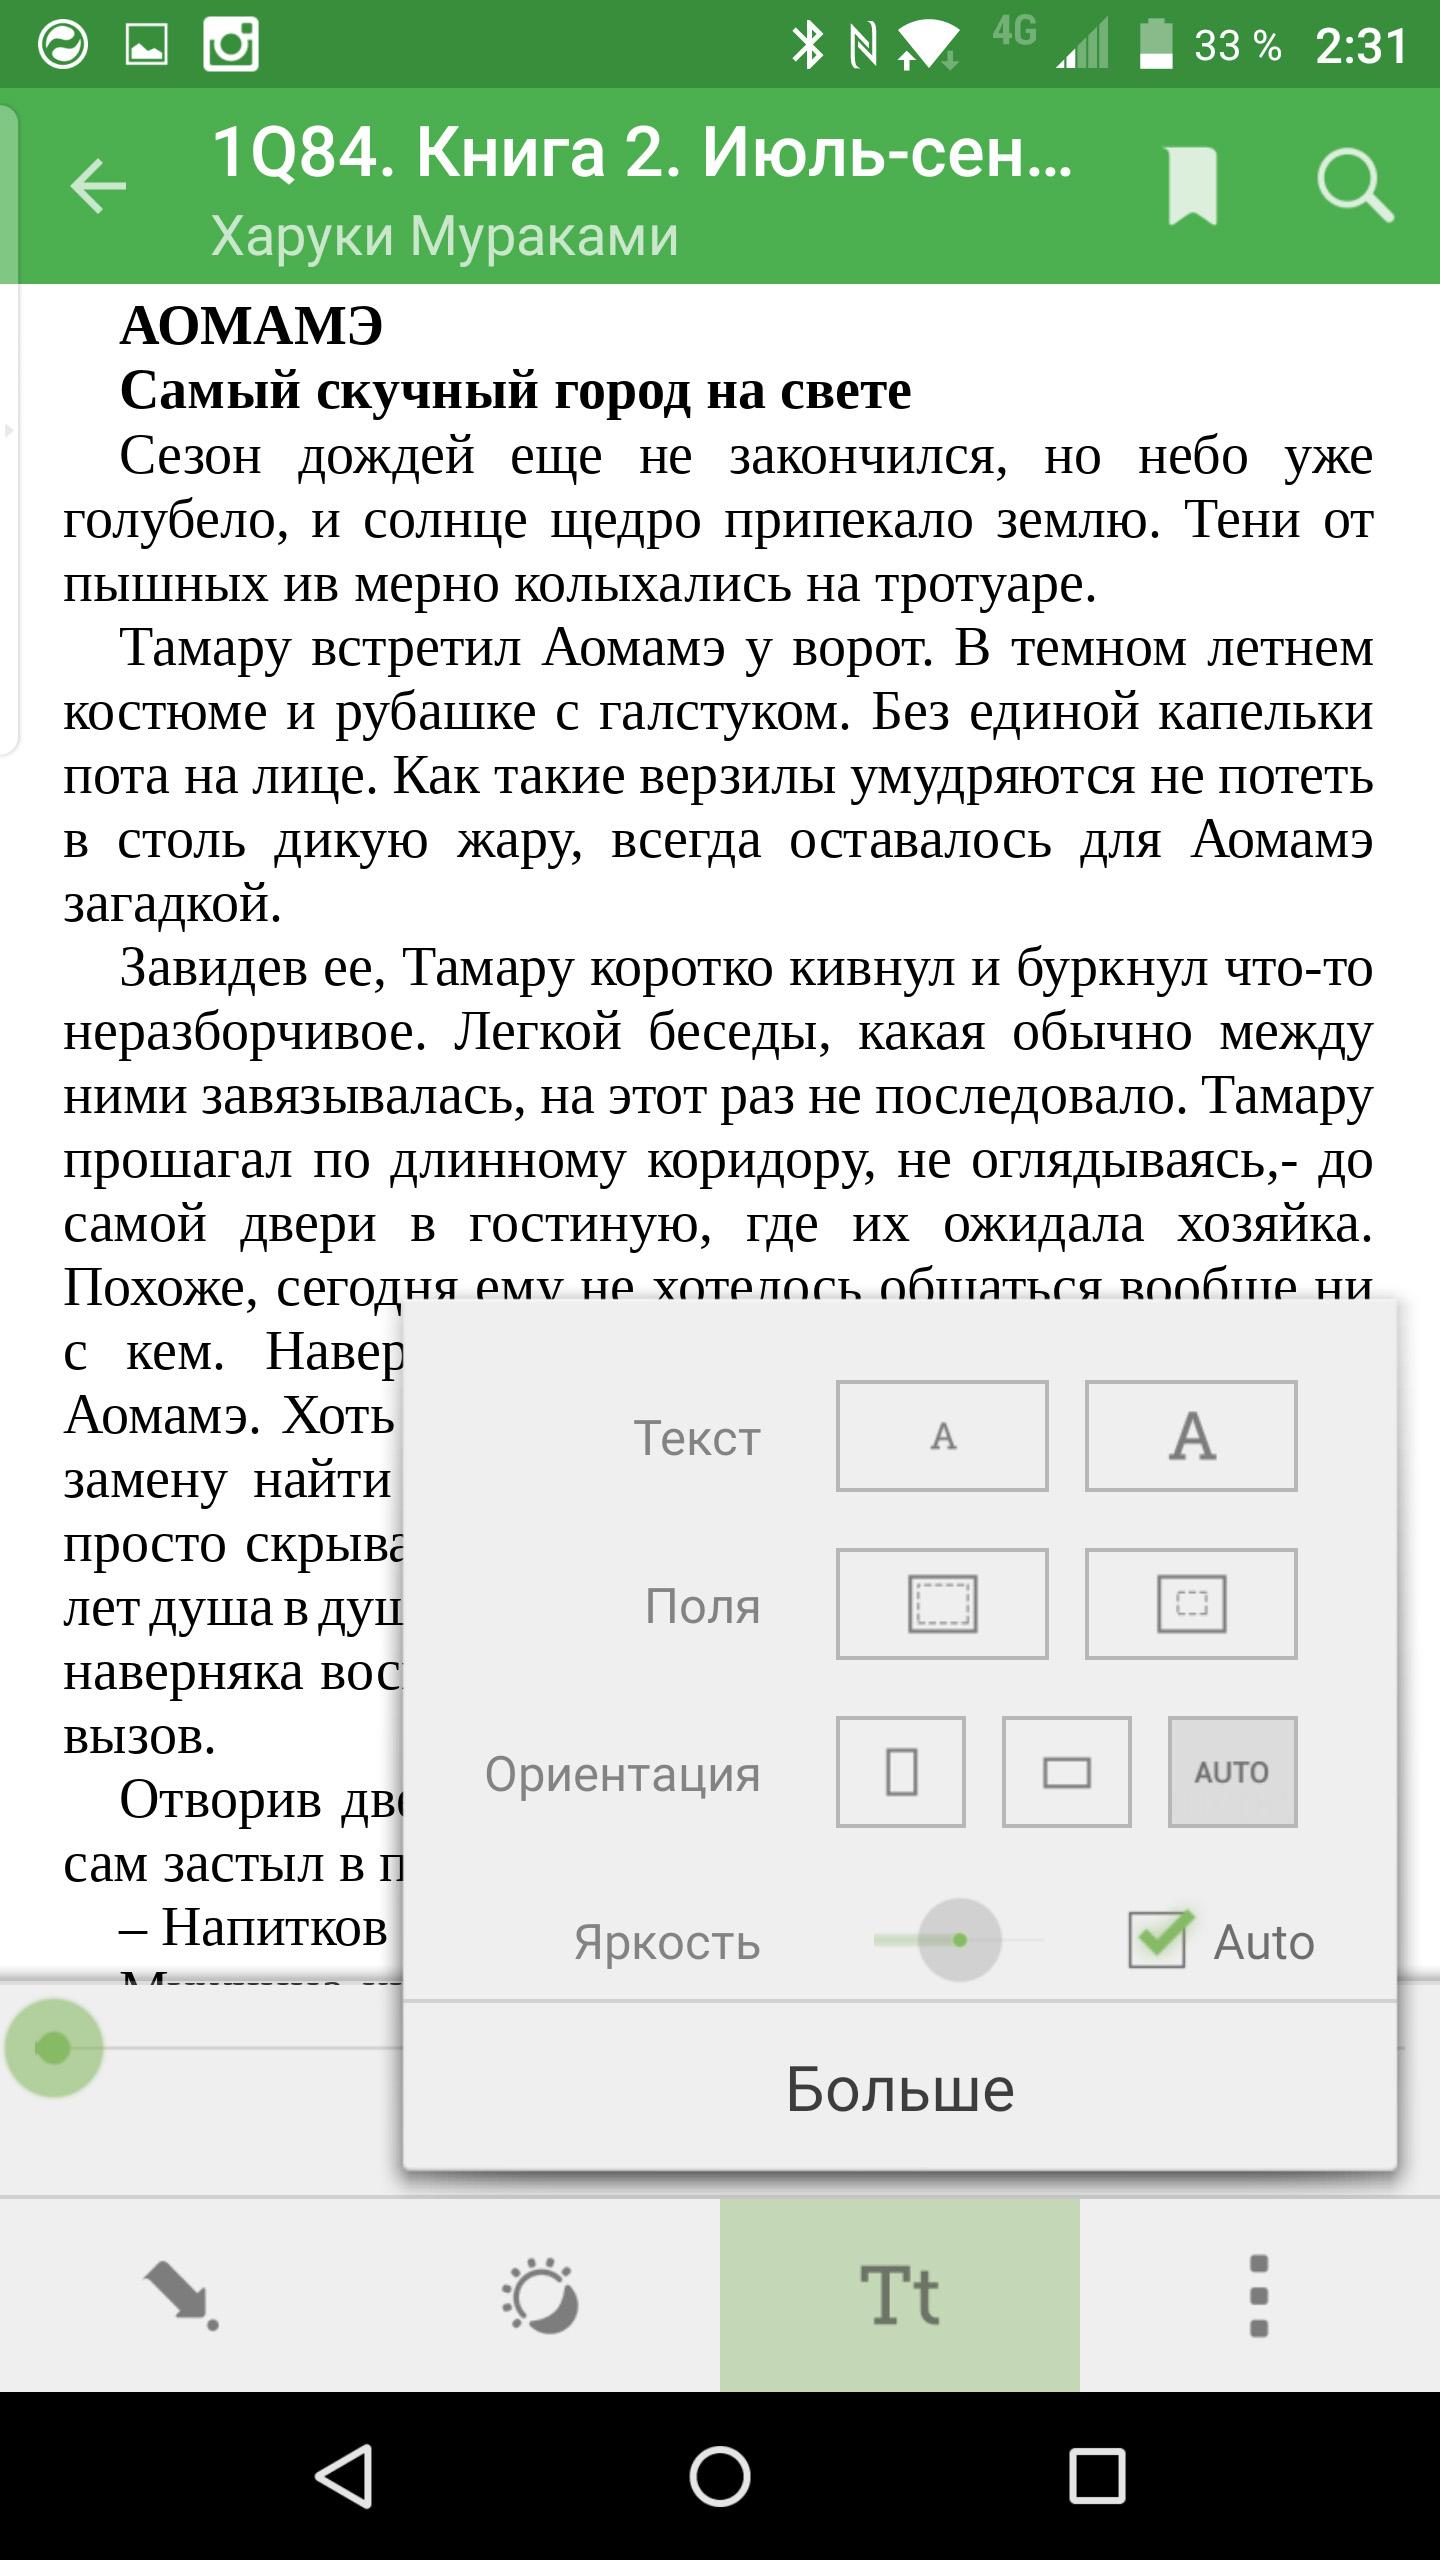 Screenshot_2016-01-18-02-31-07